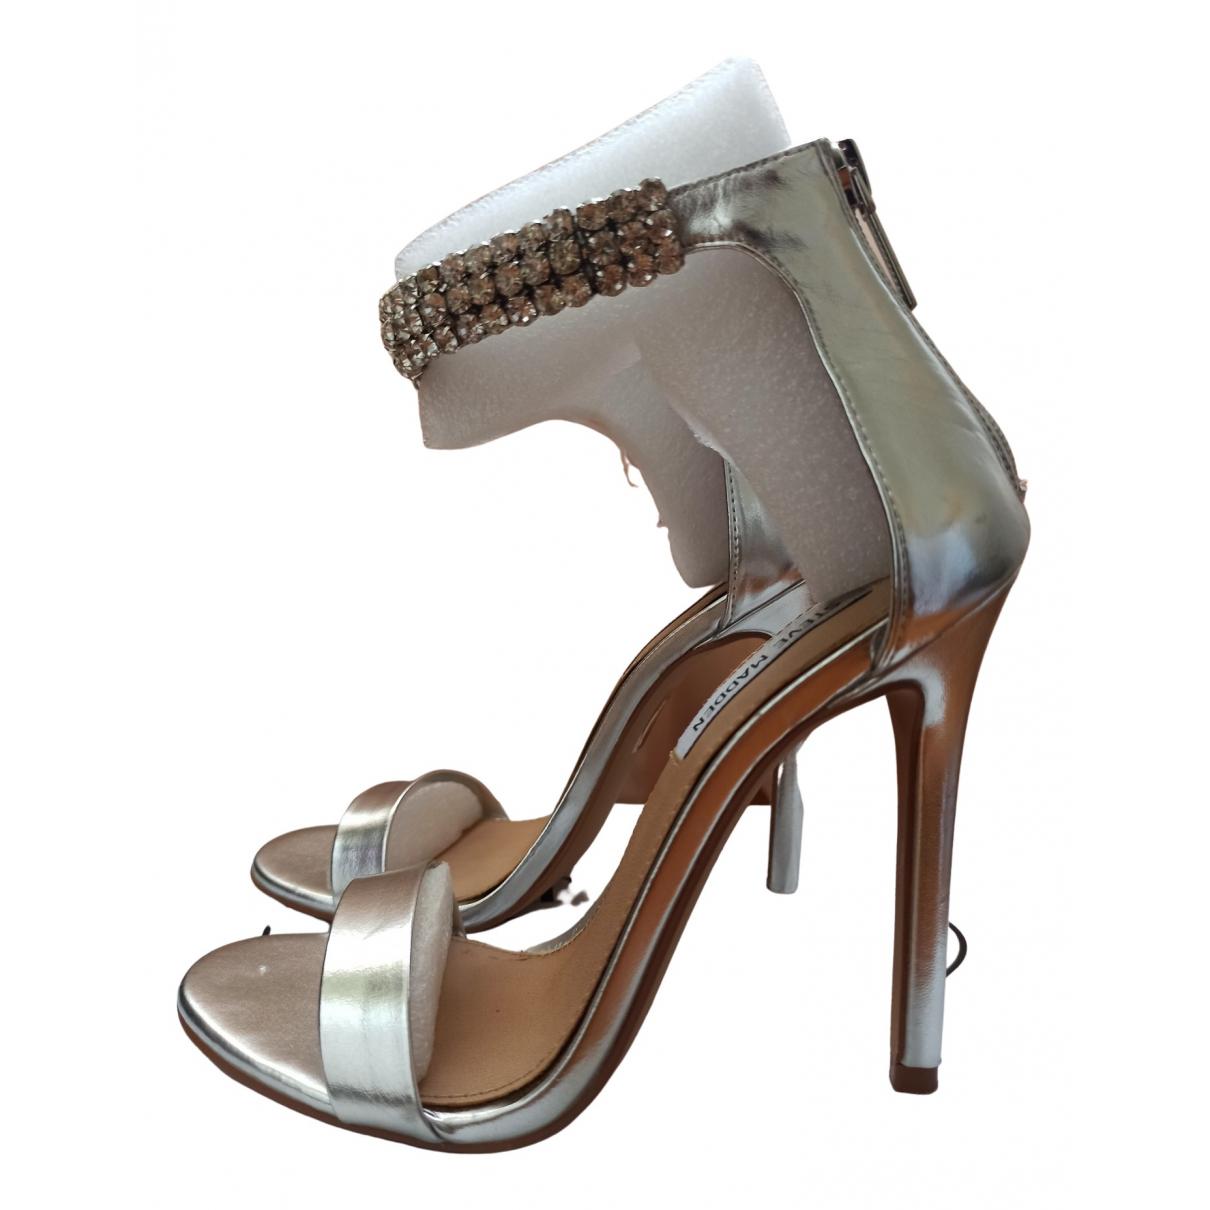 Steve Madden N Silver Leather Heels for Women 7 US